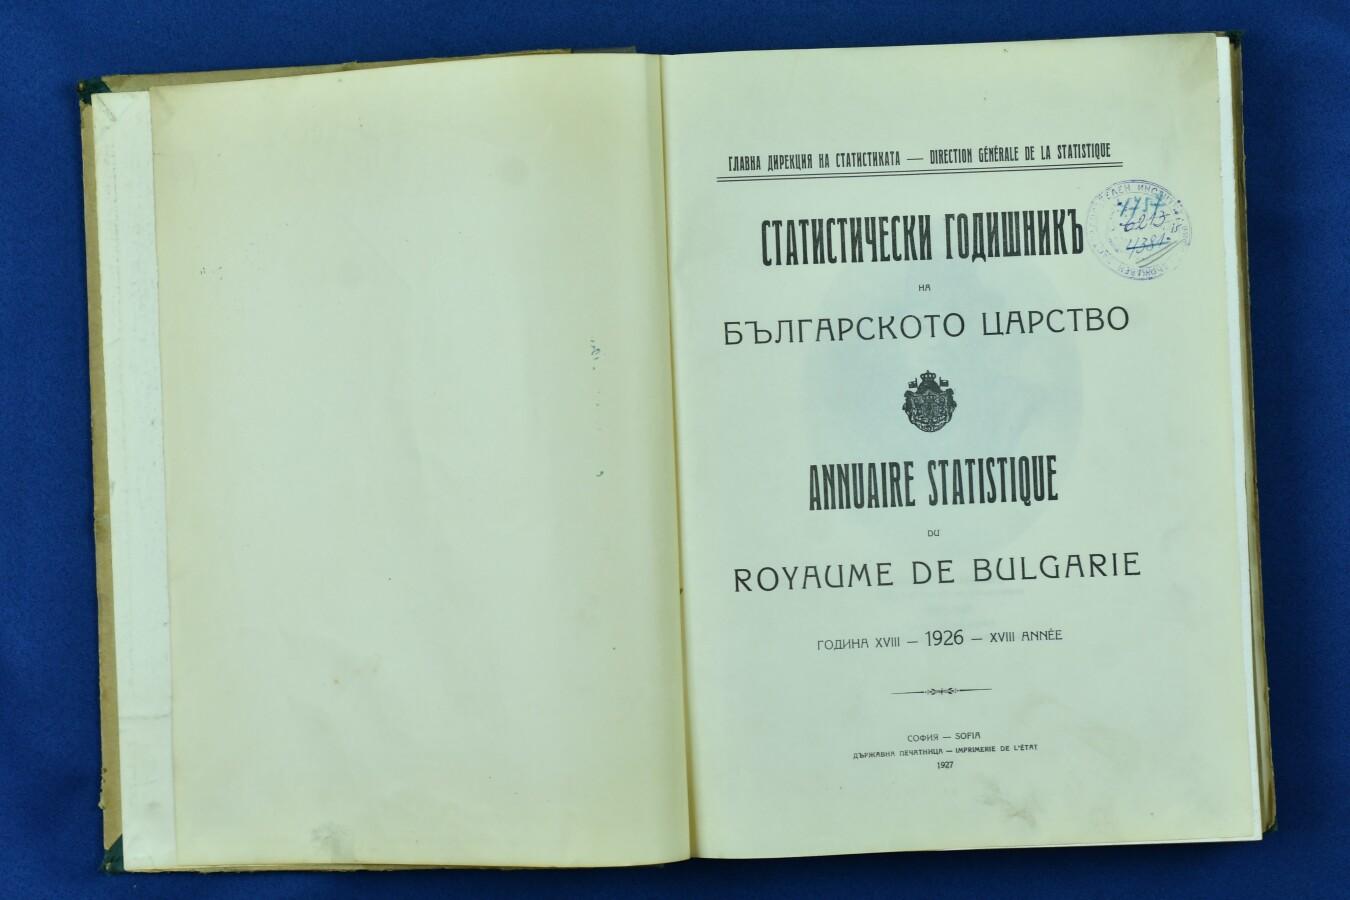 Статистически годишник, 1926 г.